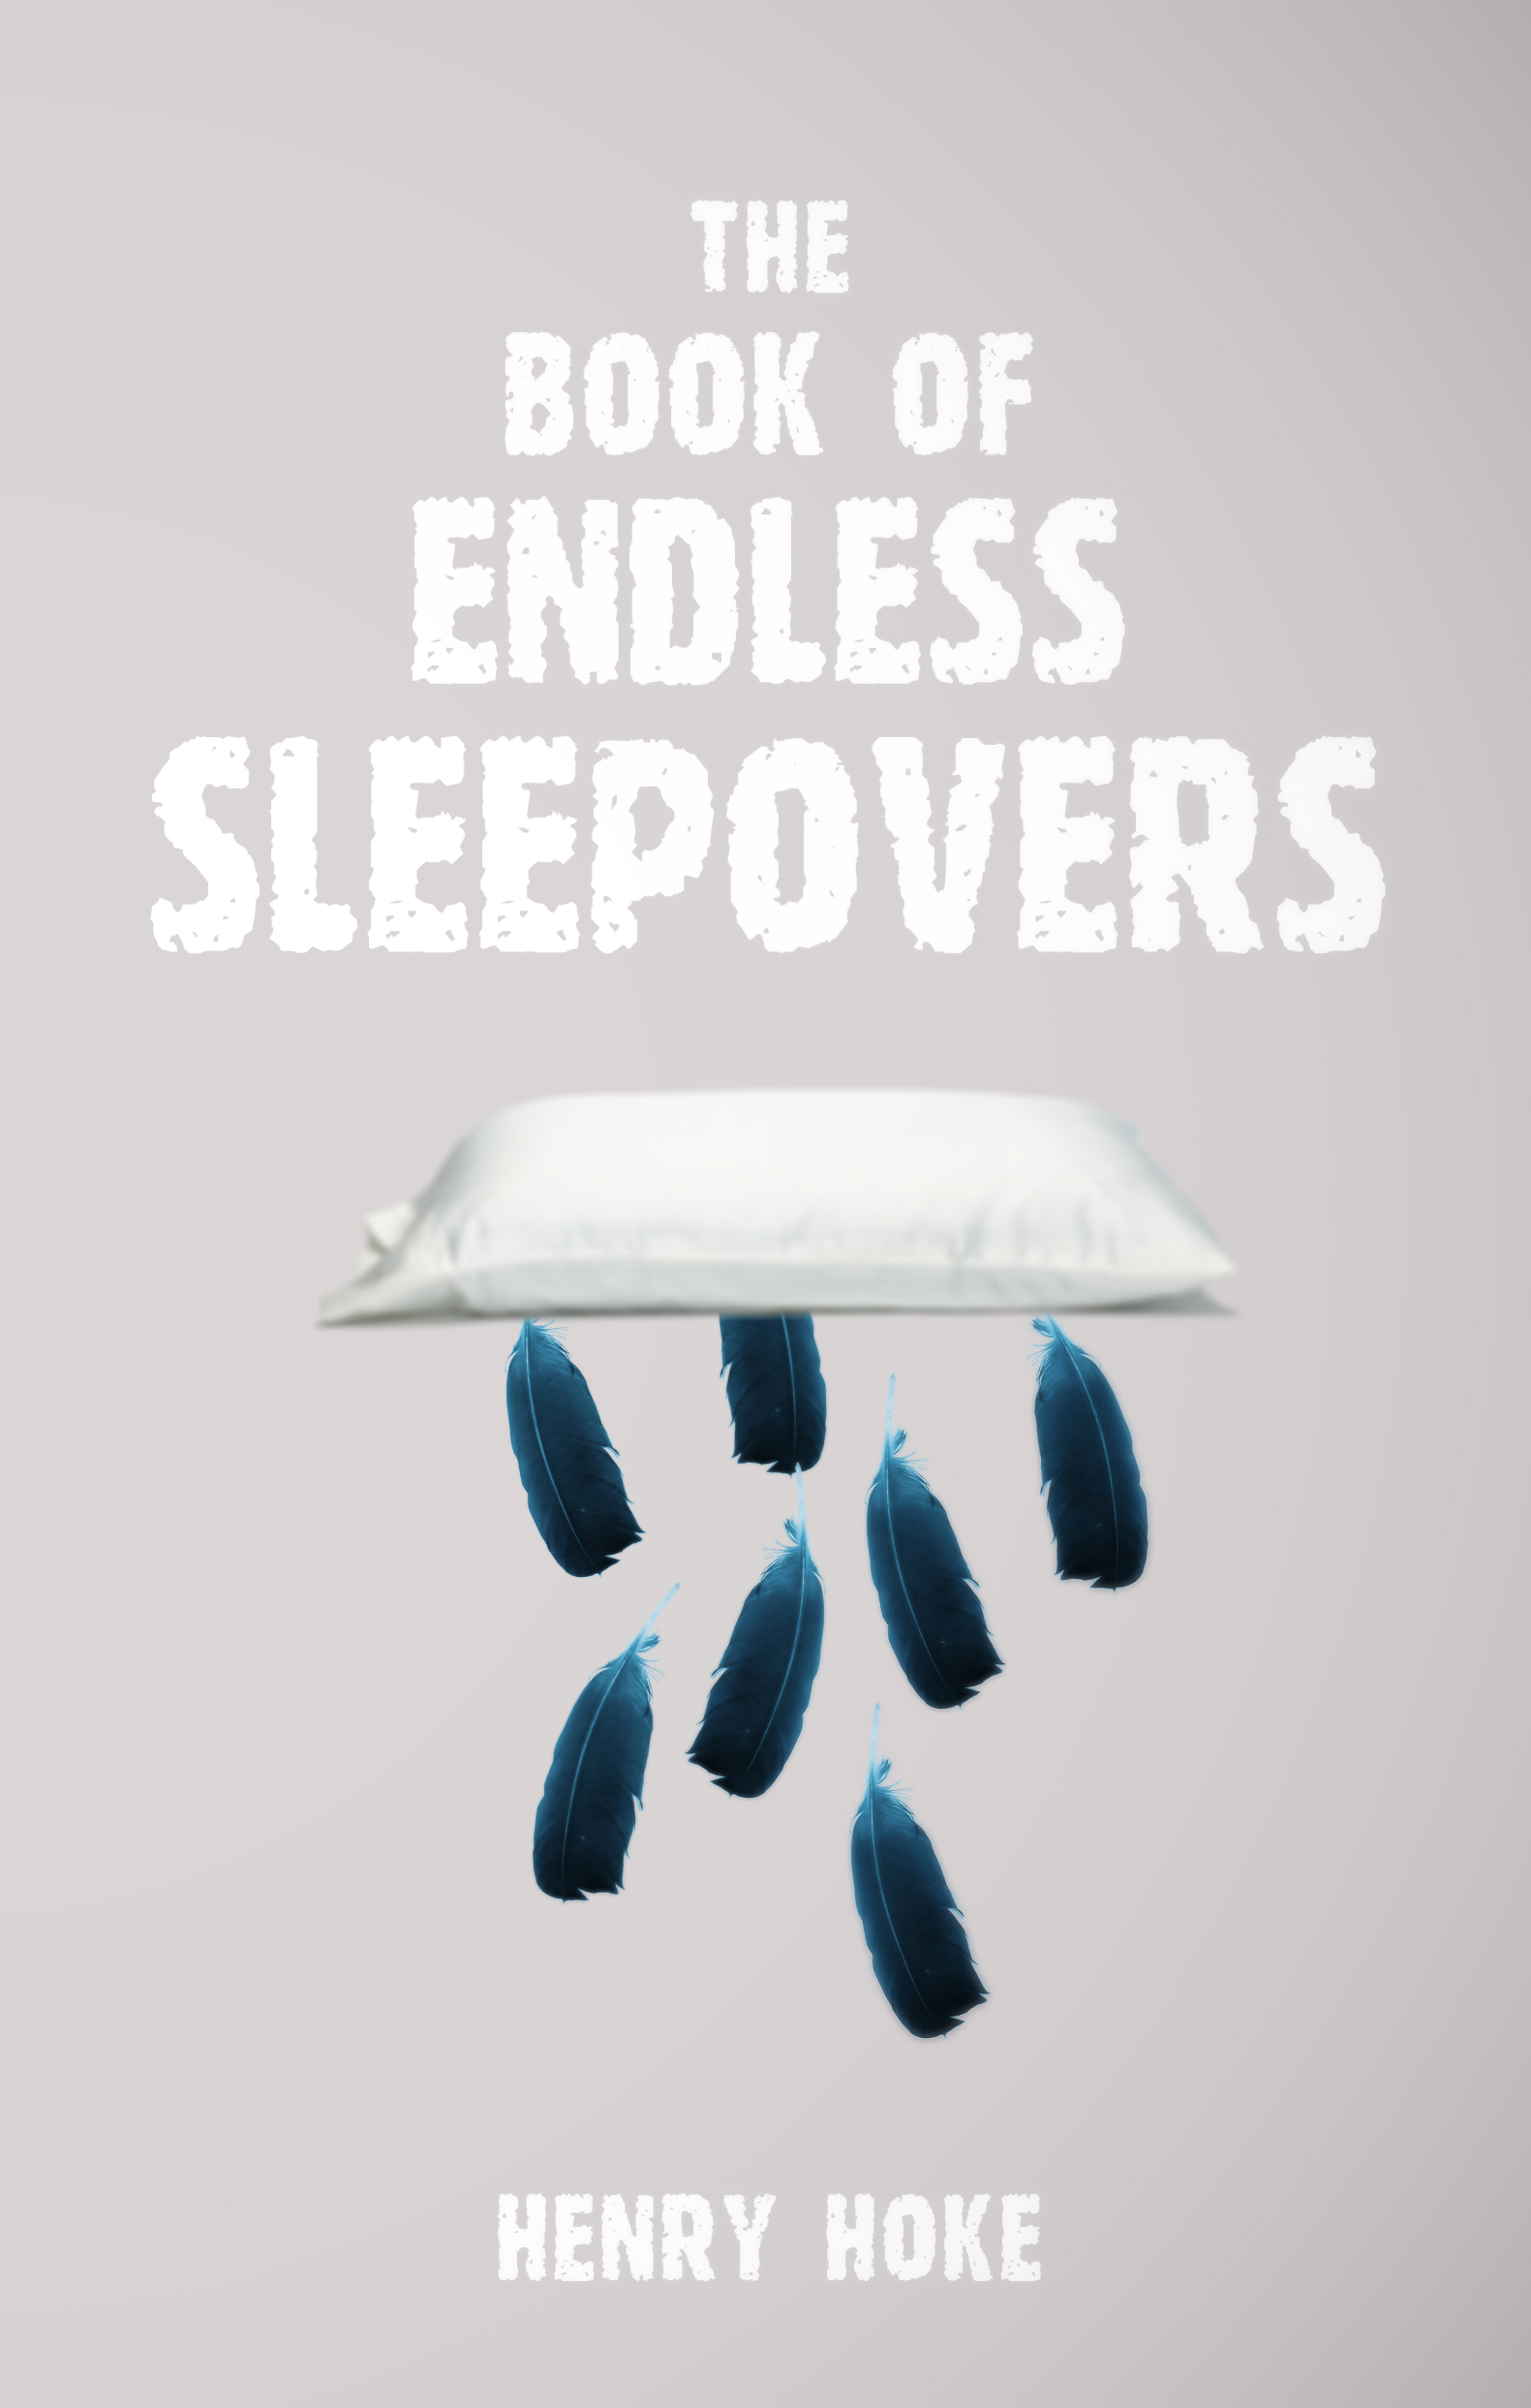 SleepoversHighRes